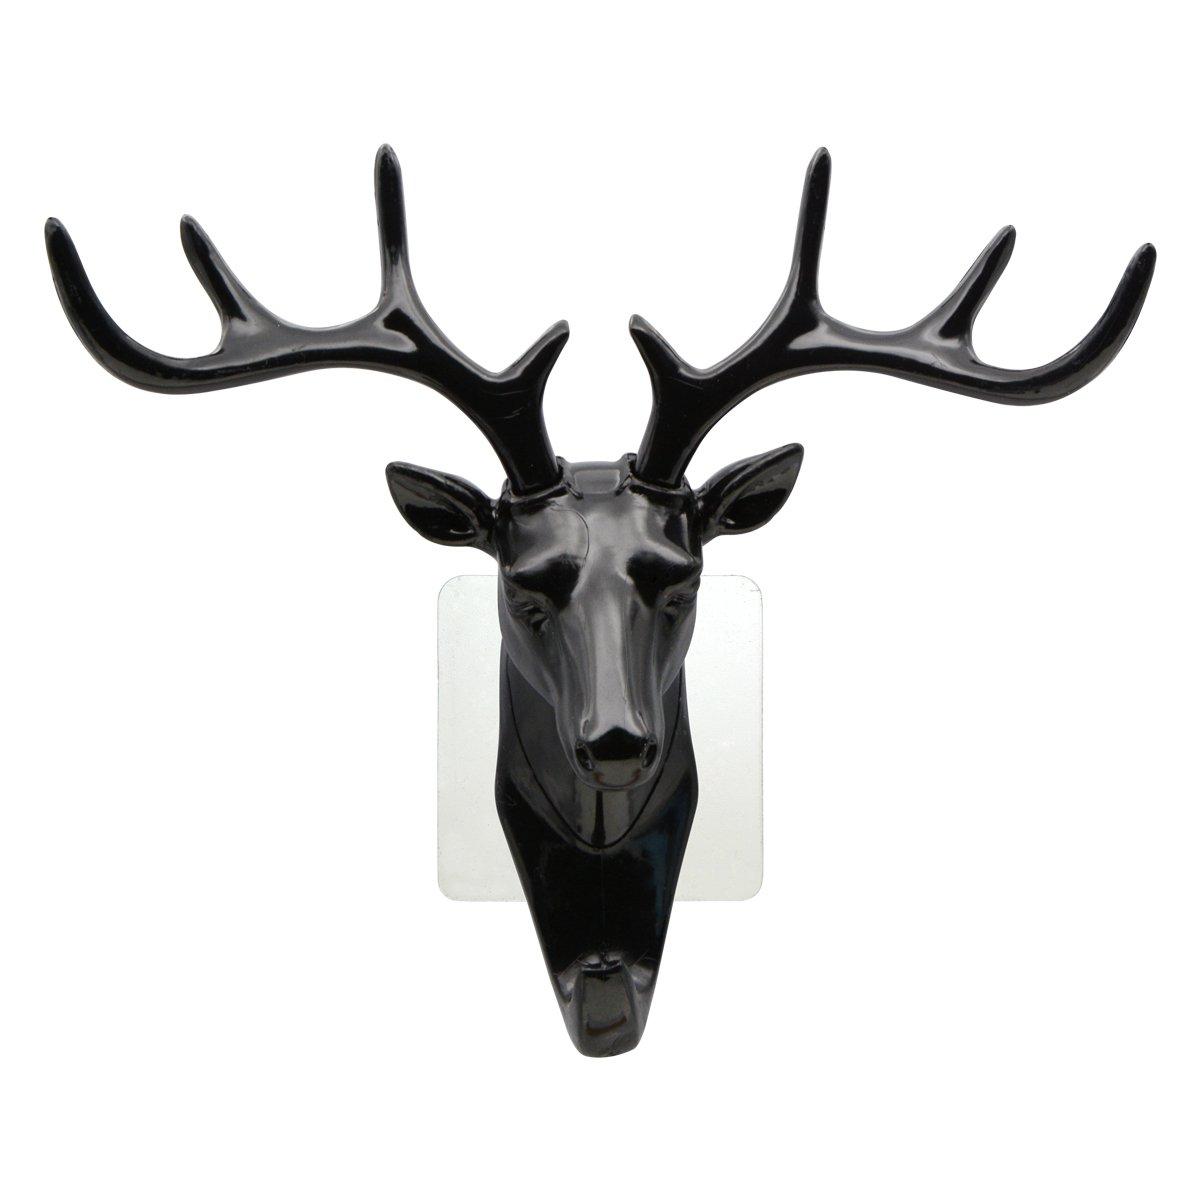 Saim Creative Plastic Hooks Wall Decor Deer Head Animal Self Clothing Jewelry Display Racks Non Black 3Pcs Streaking Coat Cap Bag Keys Hanger Hook